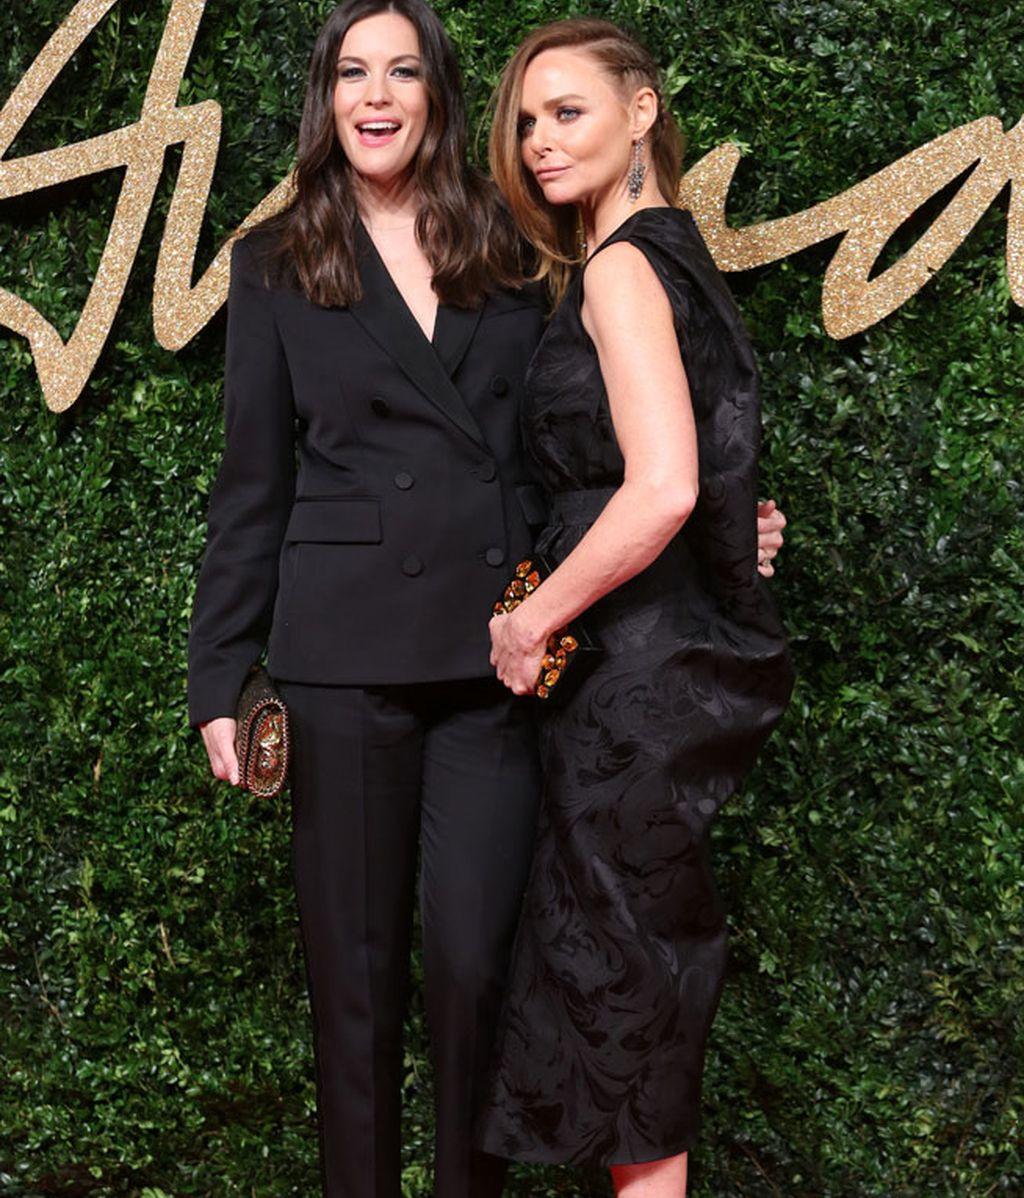 Stella McCartney, 'Marca del Año', posa con Liv Tyler